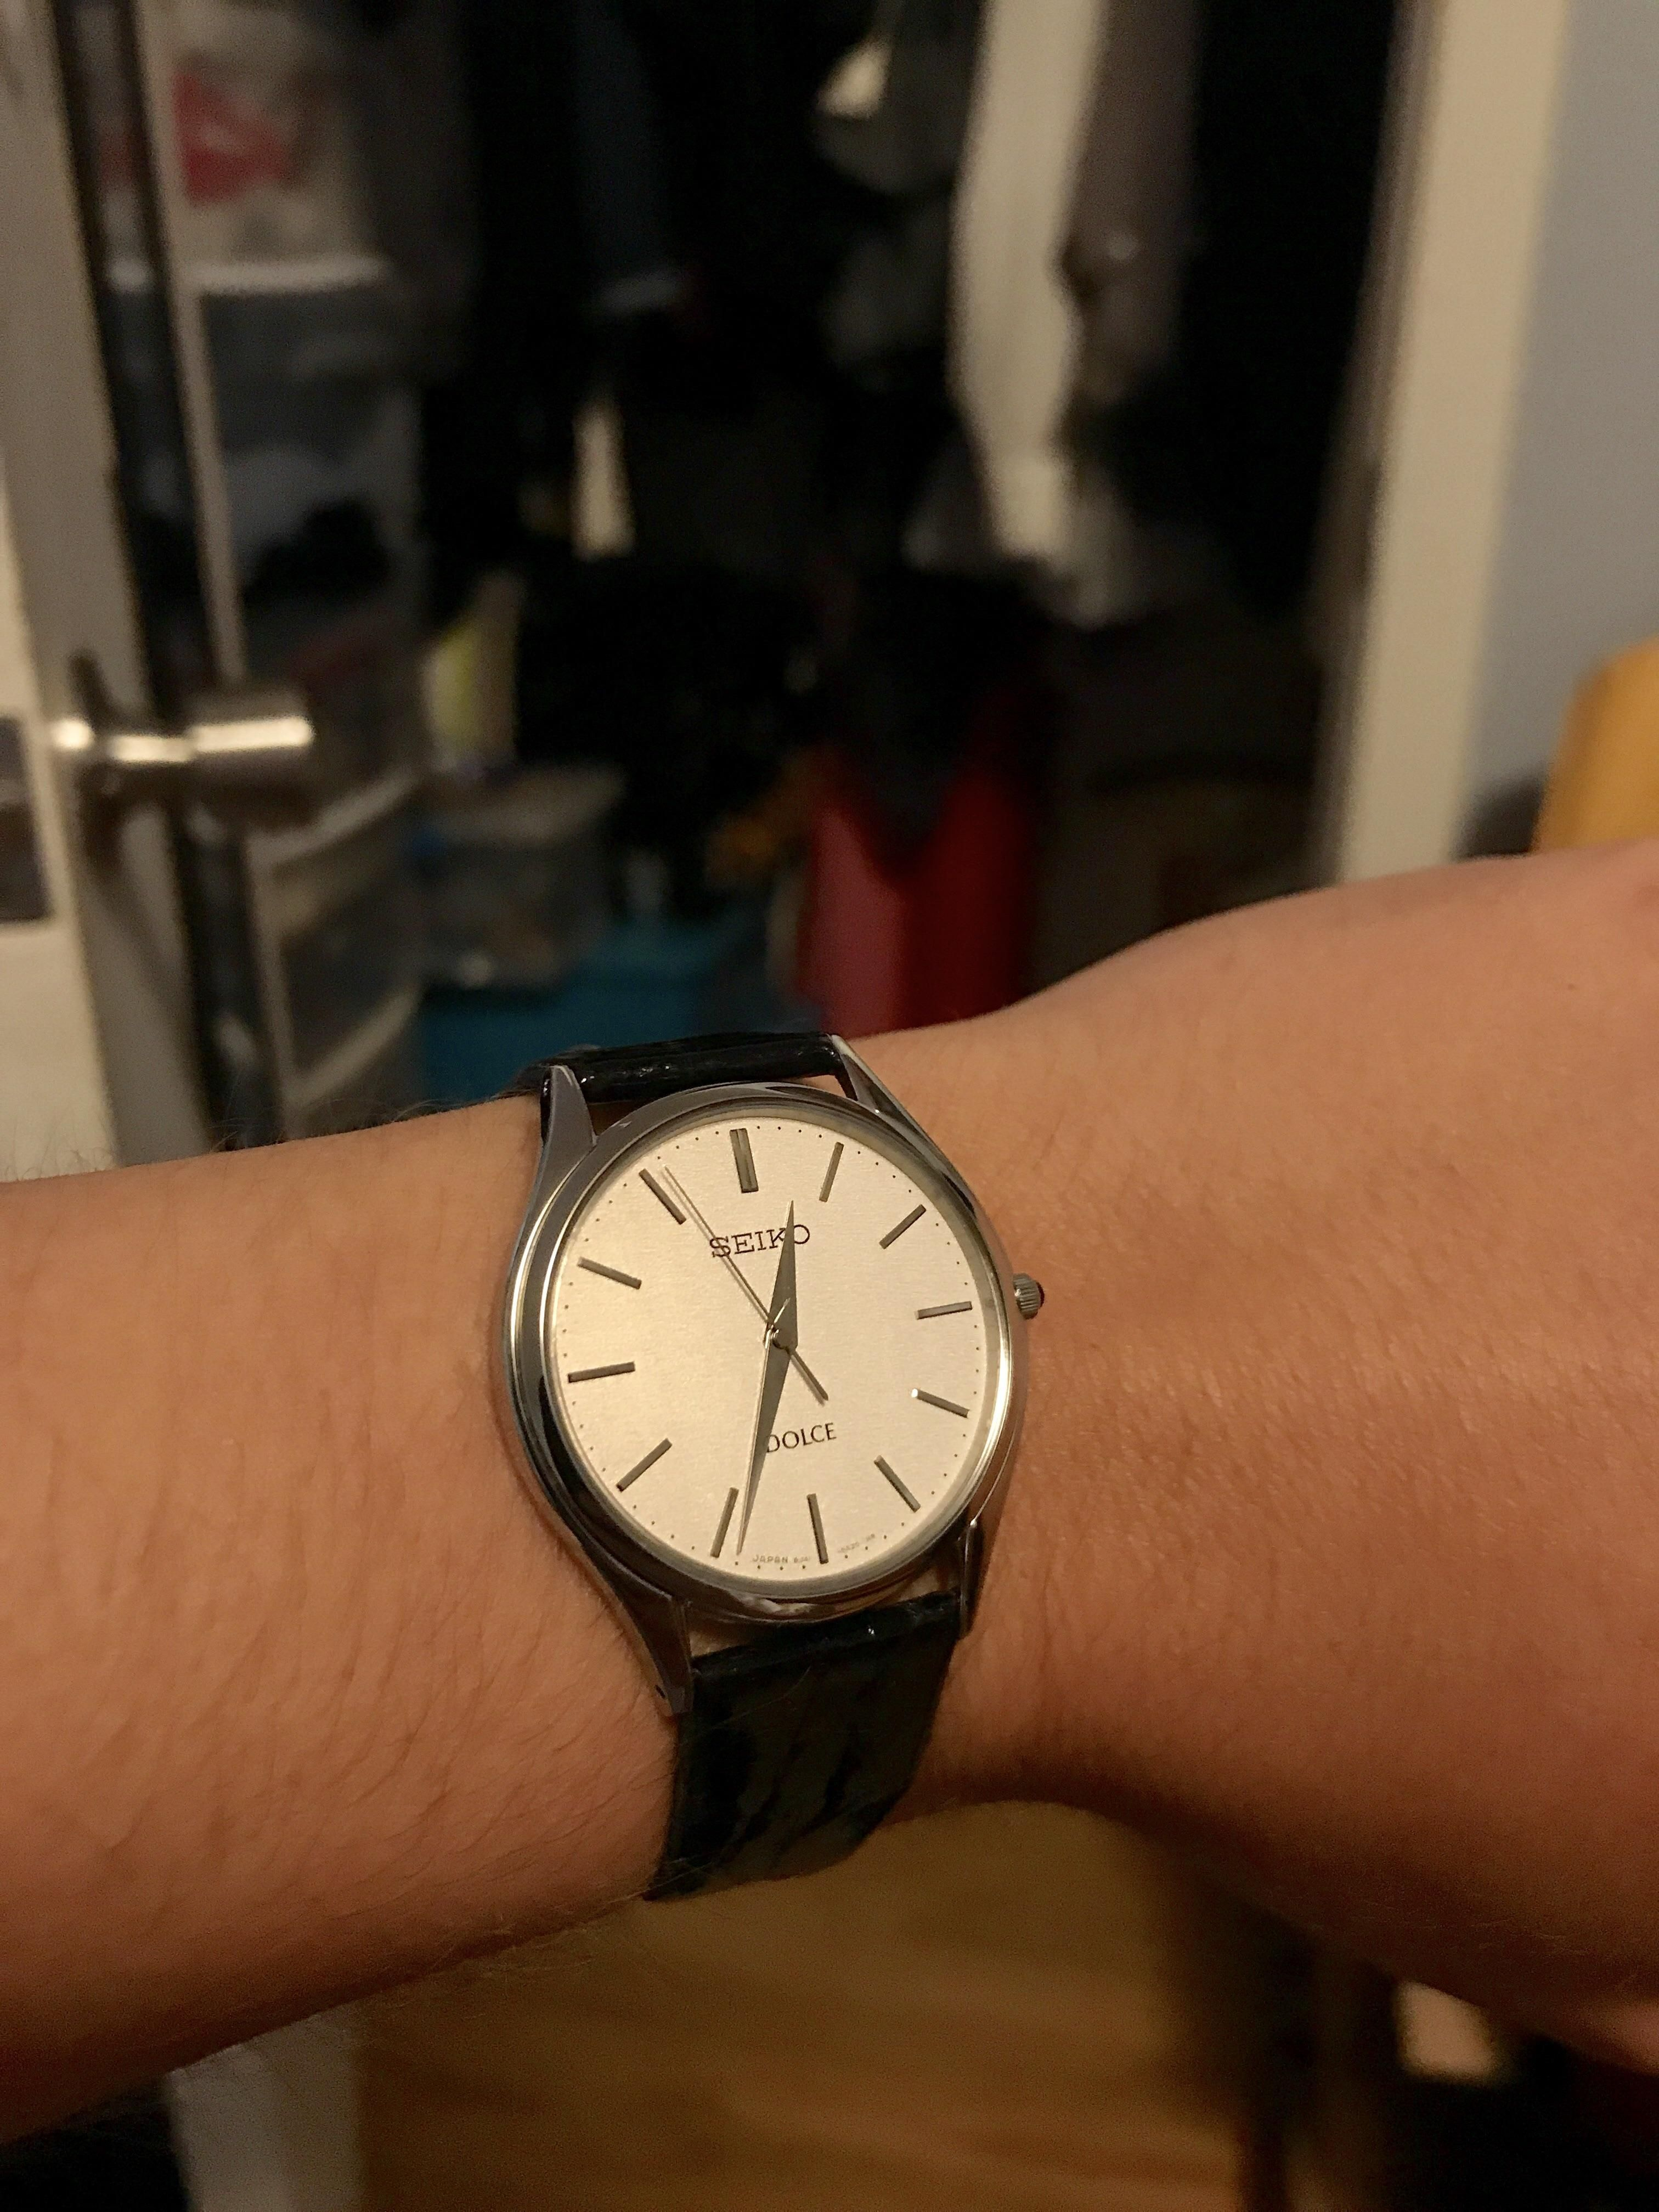 Seiko Sacm171 Came In Perfect Dress Watch Great Watches Around Bulova 90271 Jam Tangan Pria Silver